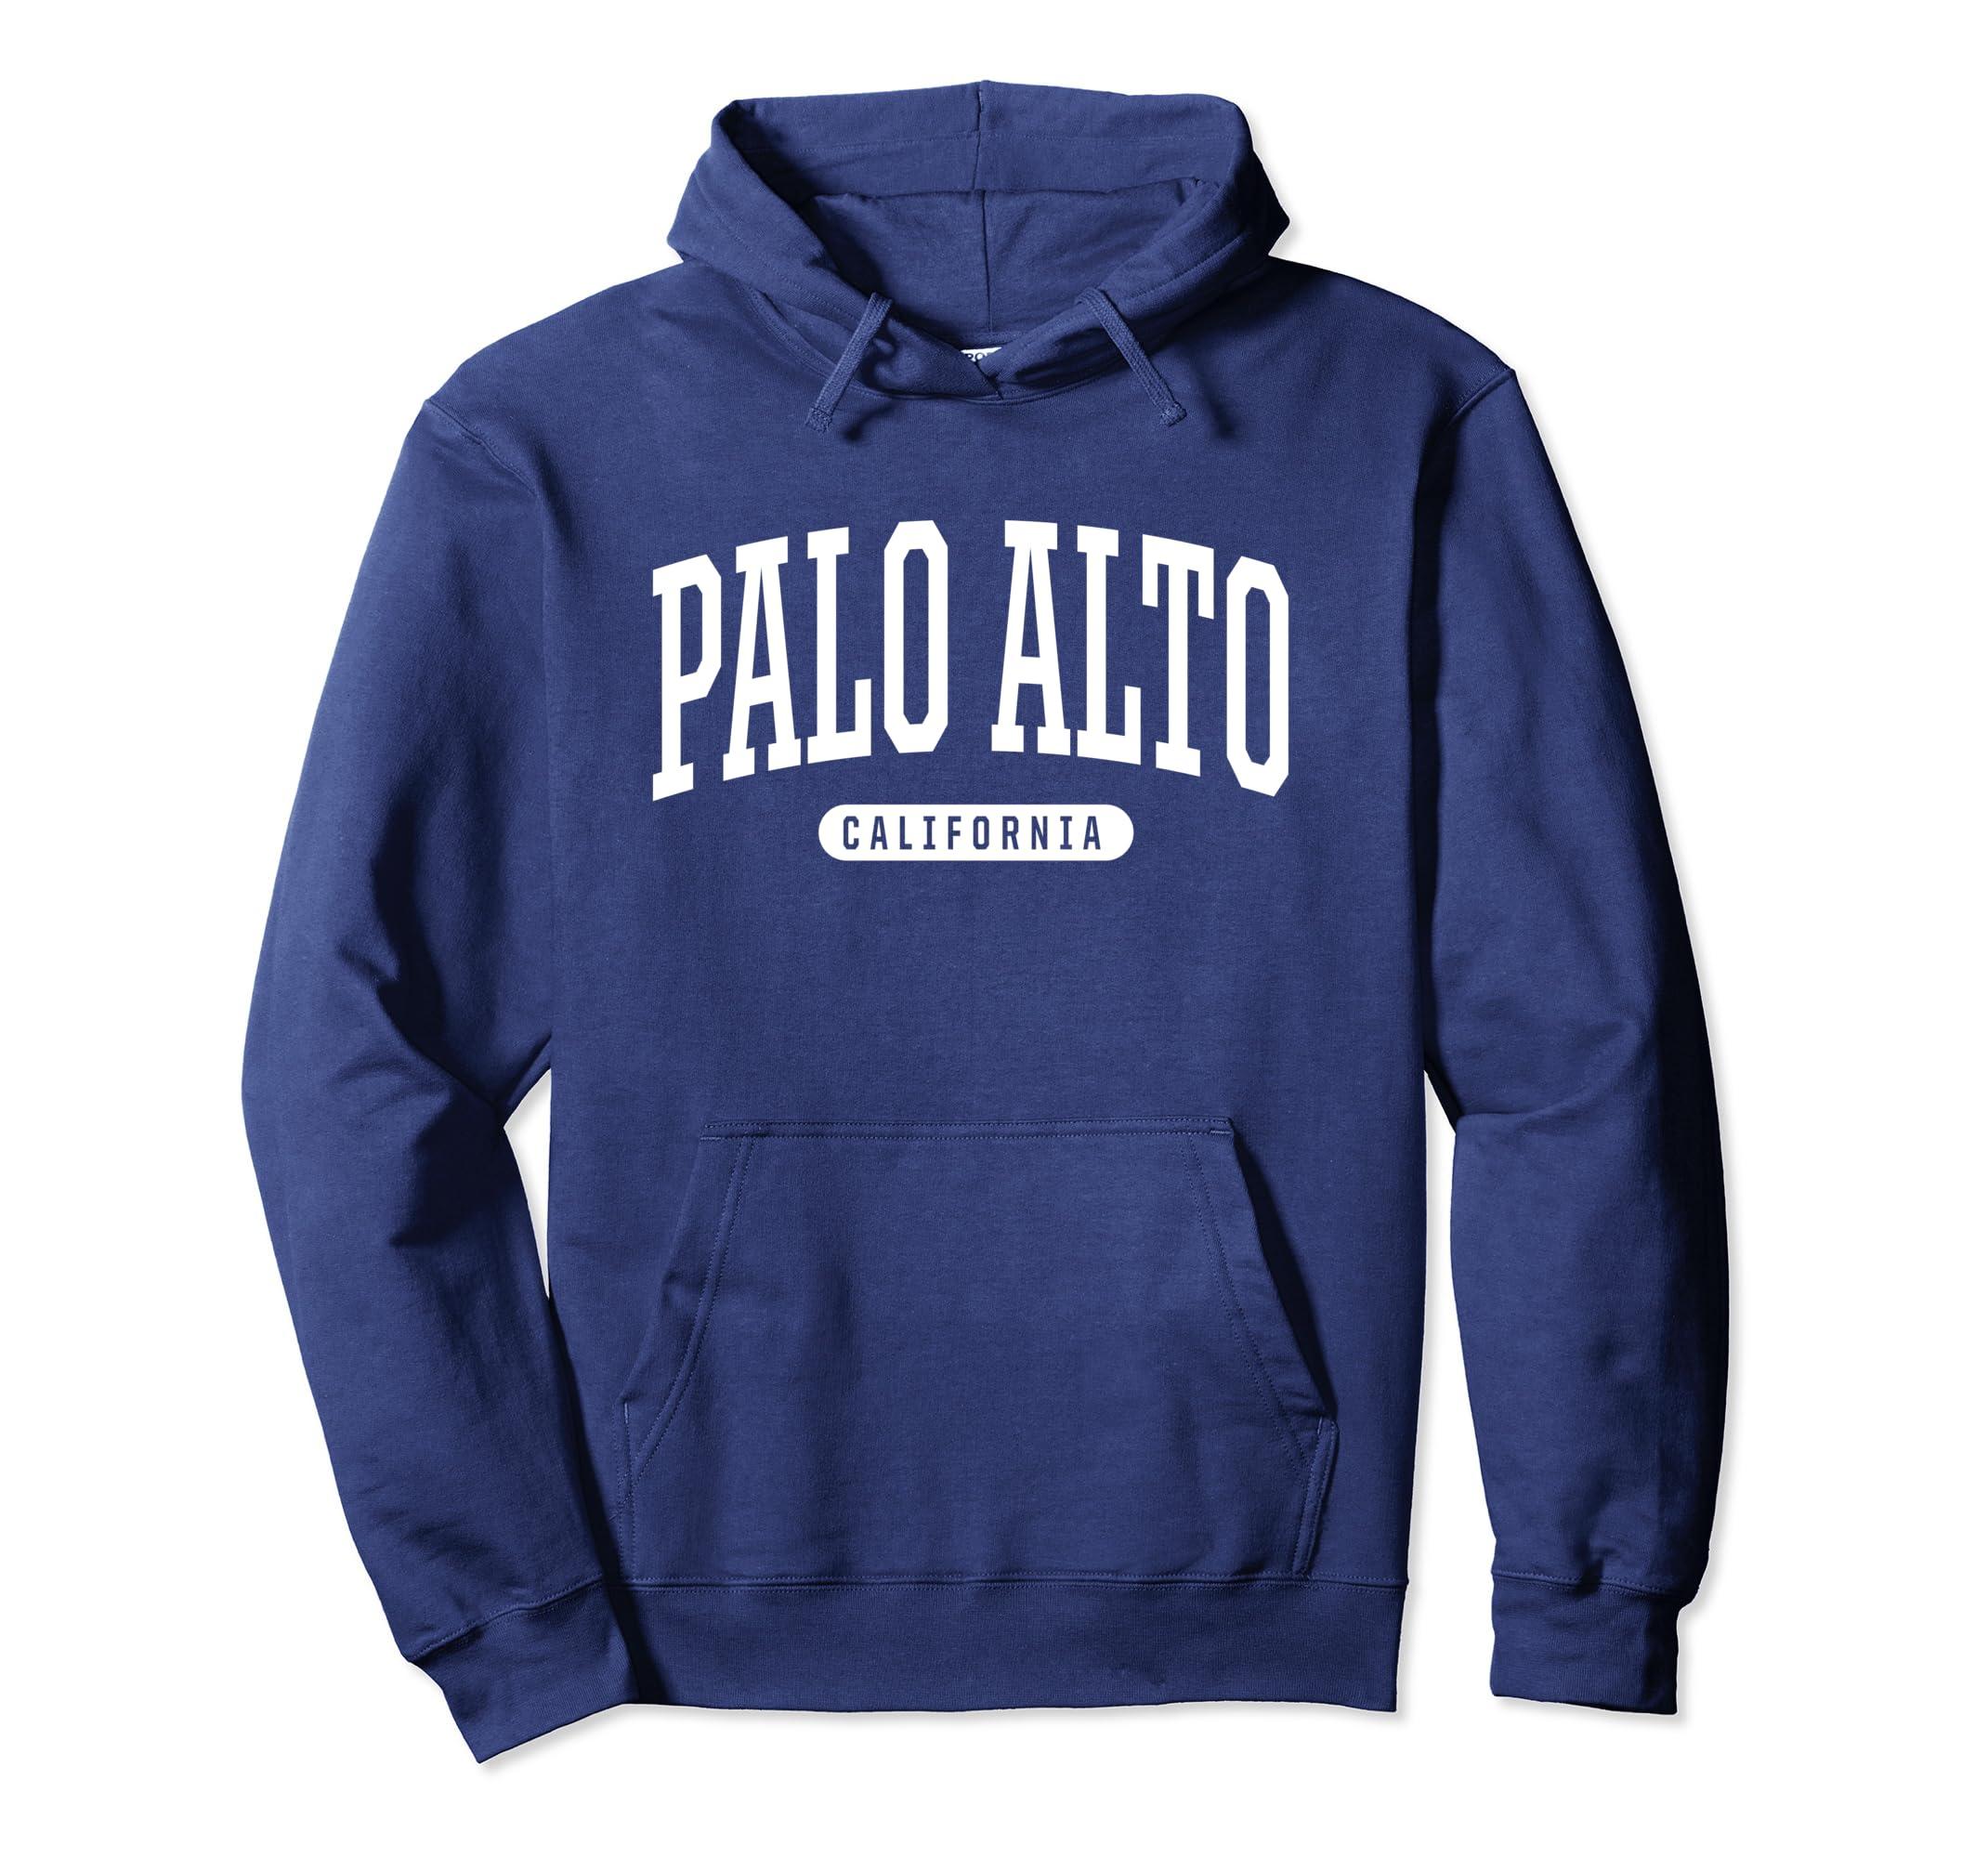 3f59e91b Amazon.com: Palo Alto Hoodie Sweatshirt College University Style CA USA.:  Clothing